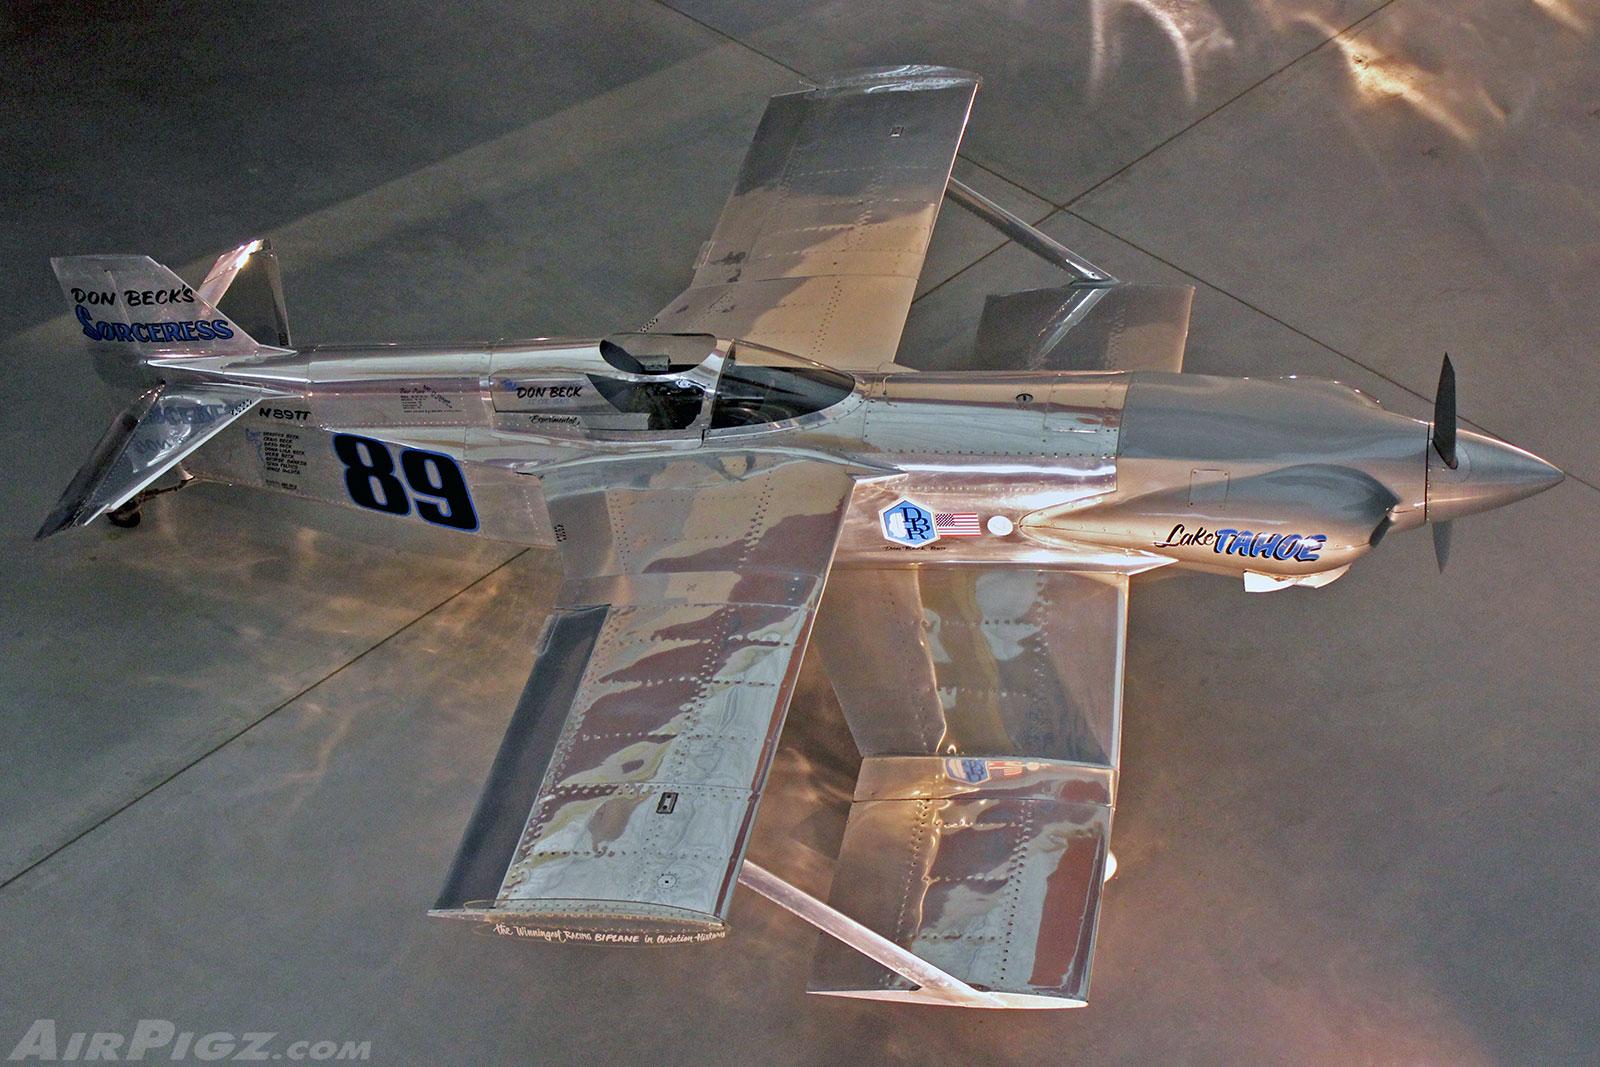 http://airpigz.com/storage/hi-res/2013/Sorceress-1970-Reno-Biplane-Racer-1.27.13-Udvar-Hazy-.jpg